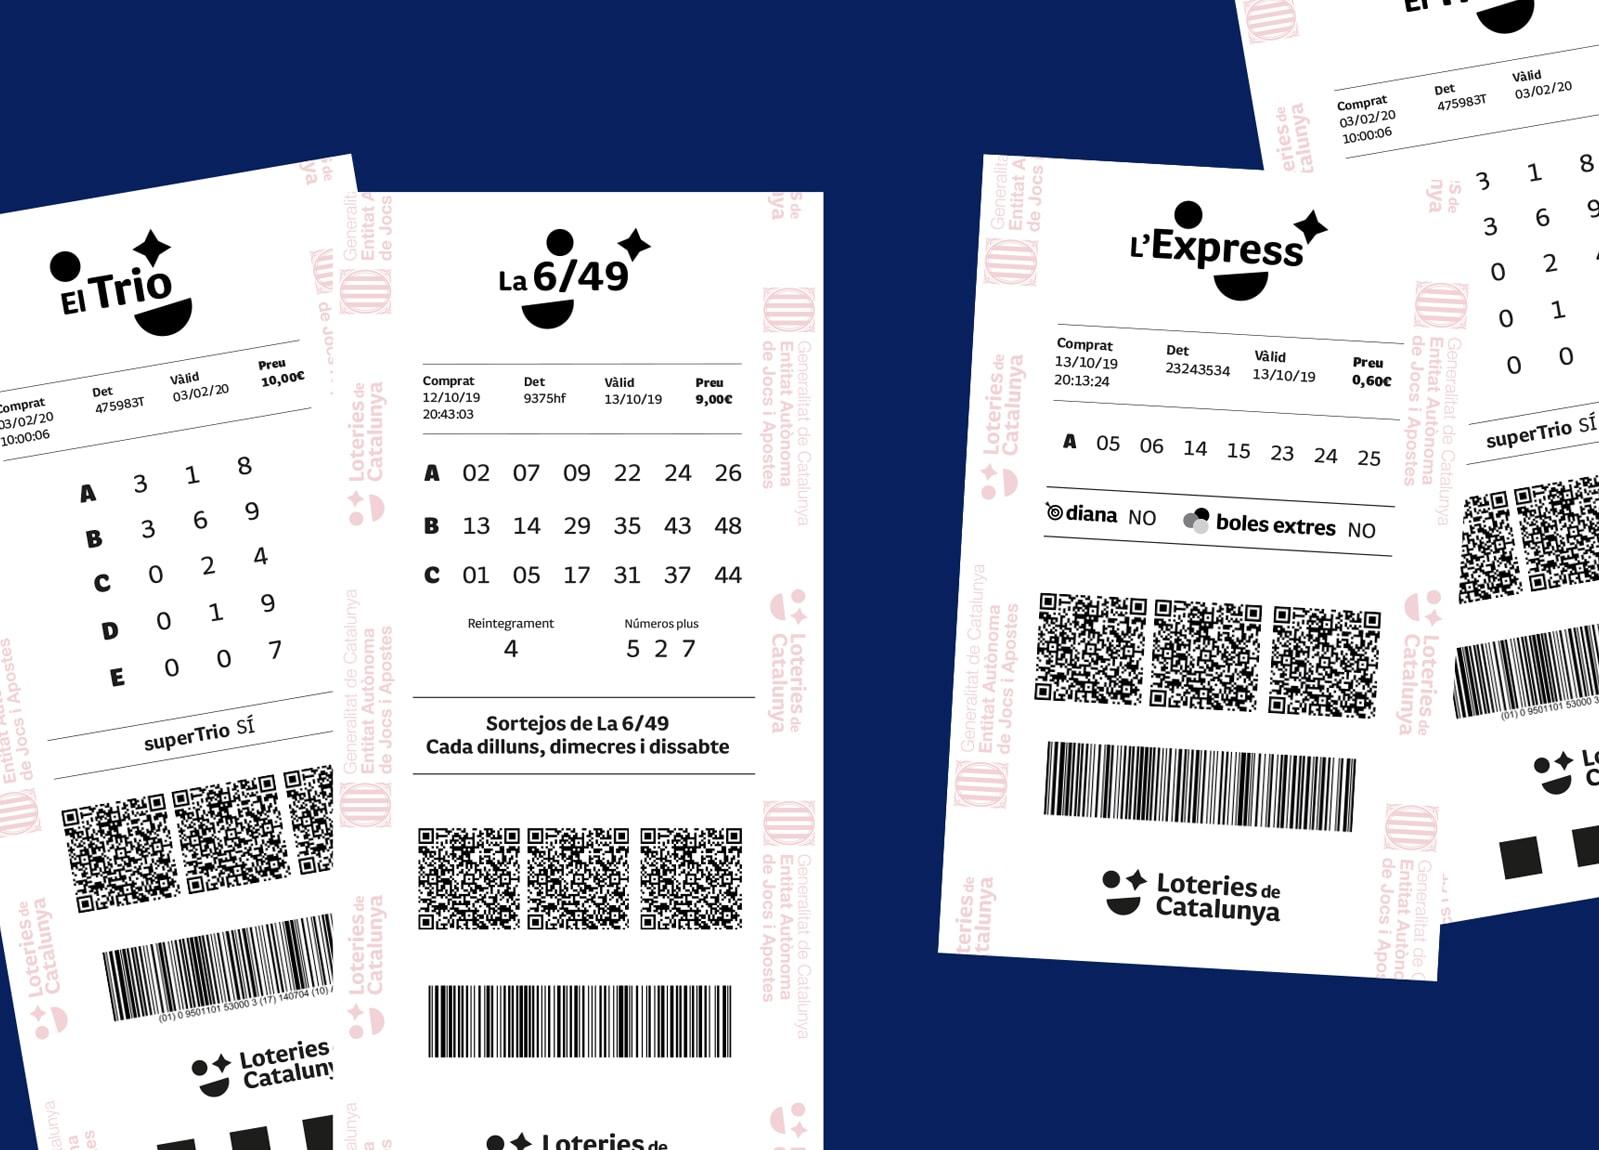 Recibo Loteries